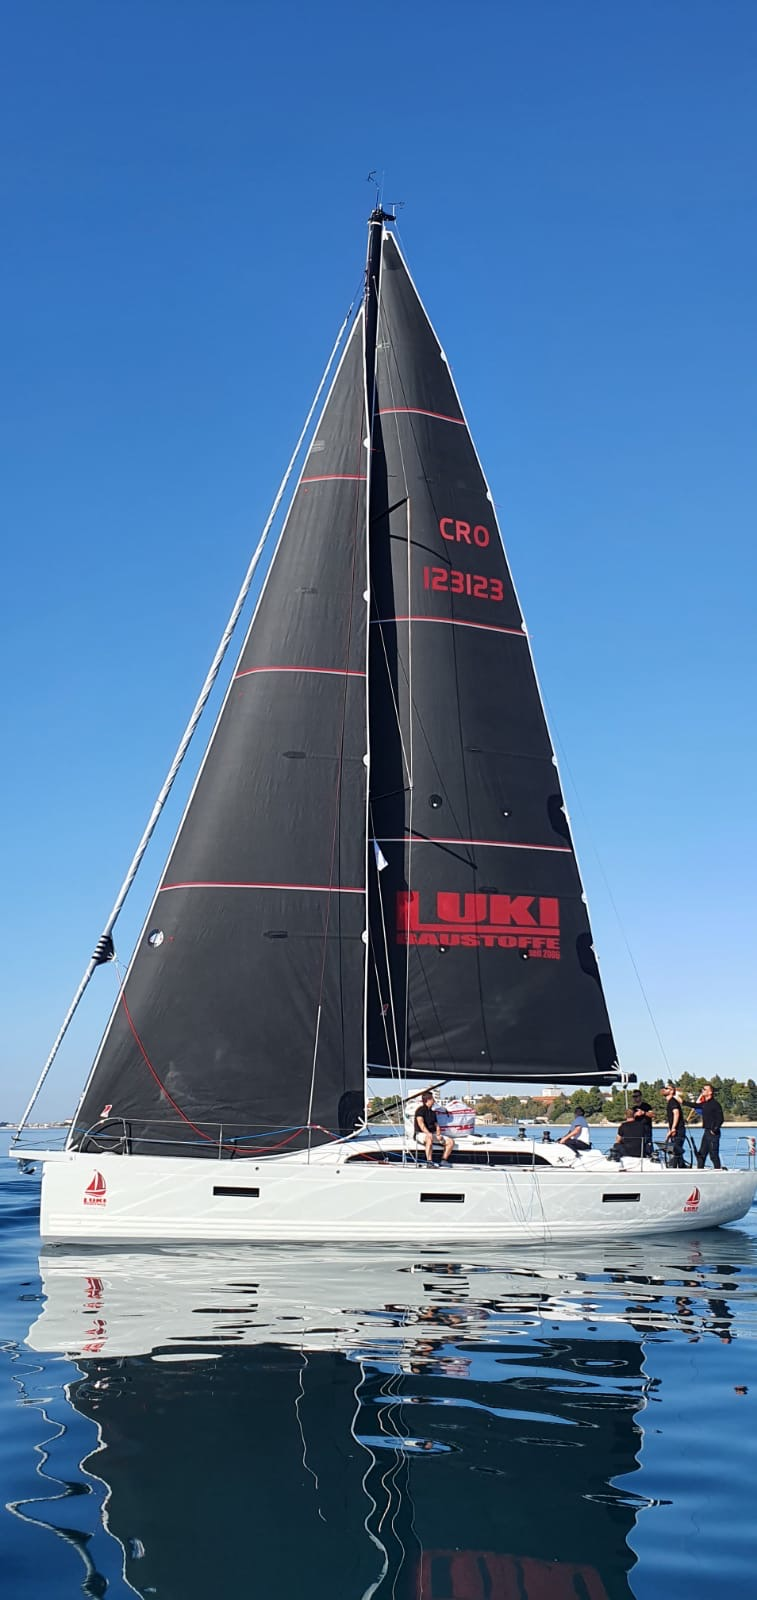 Xp 44 (FILIP)  - 12